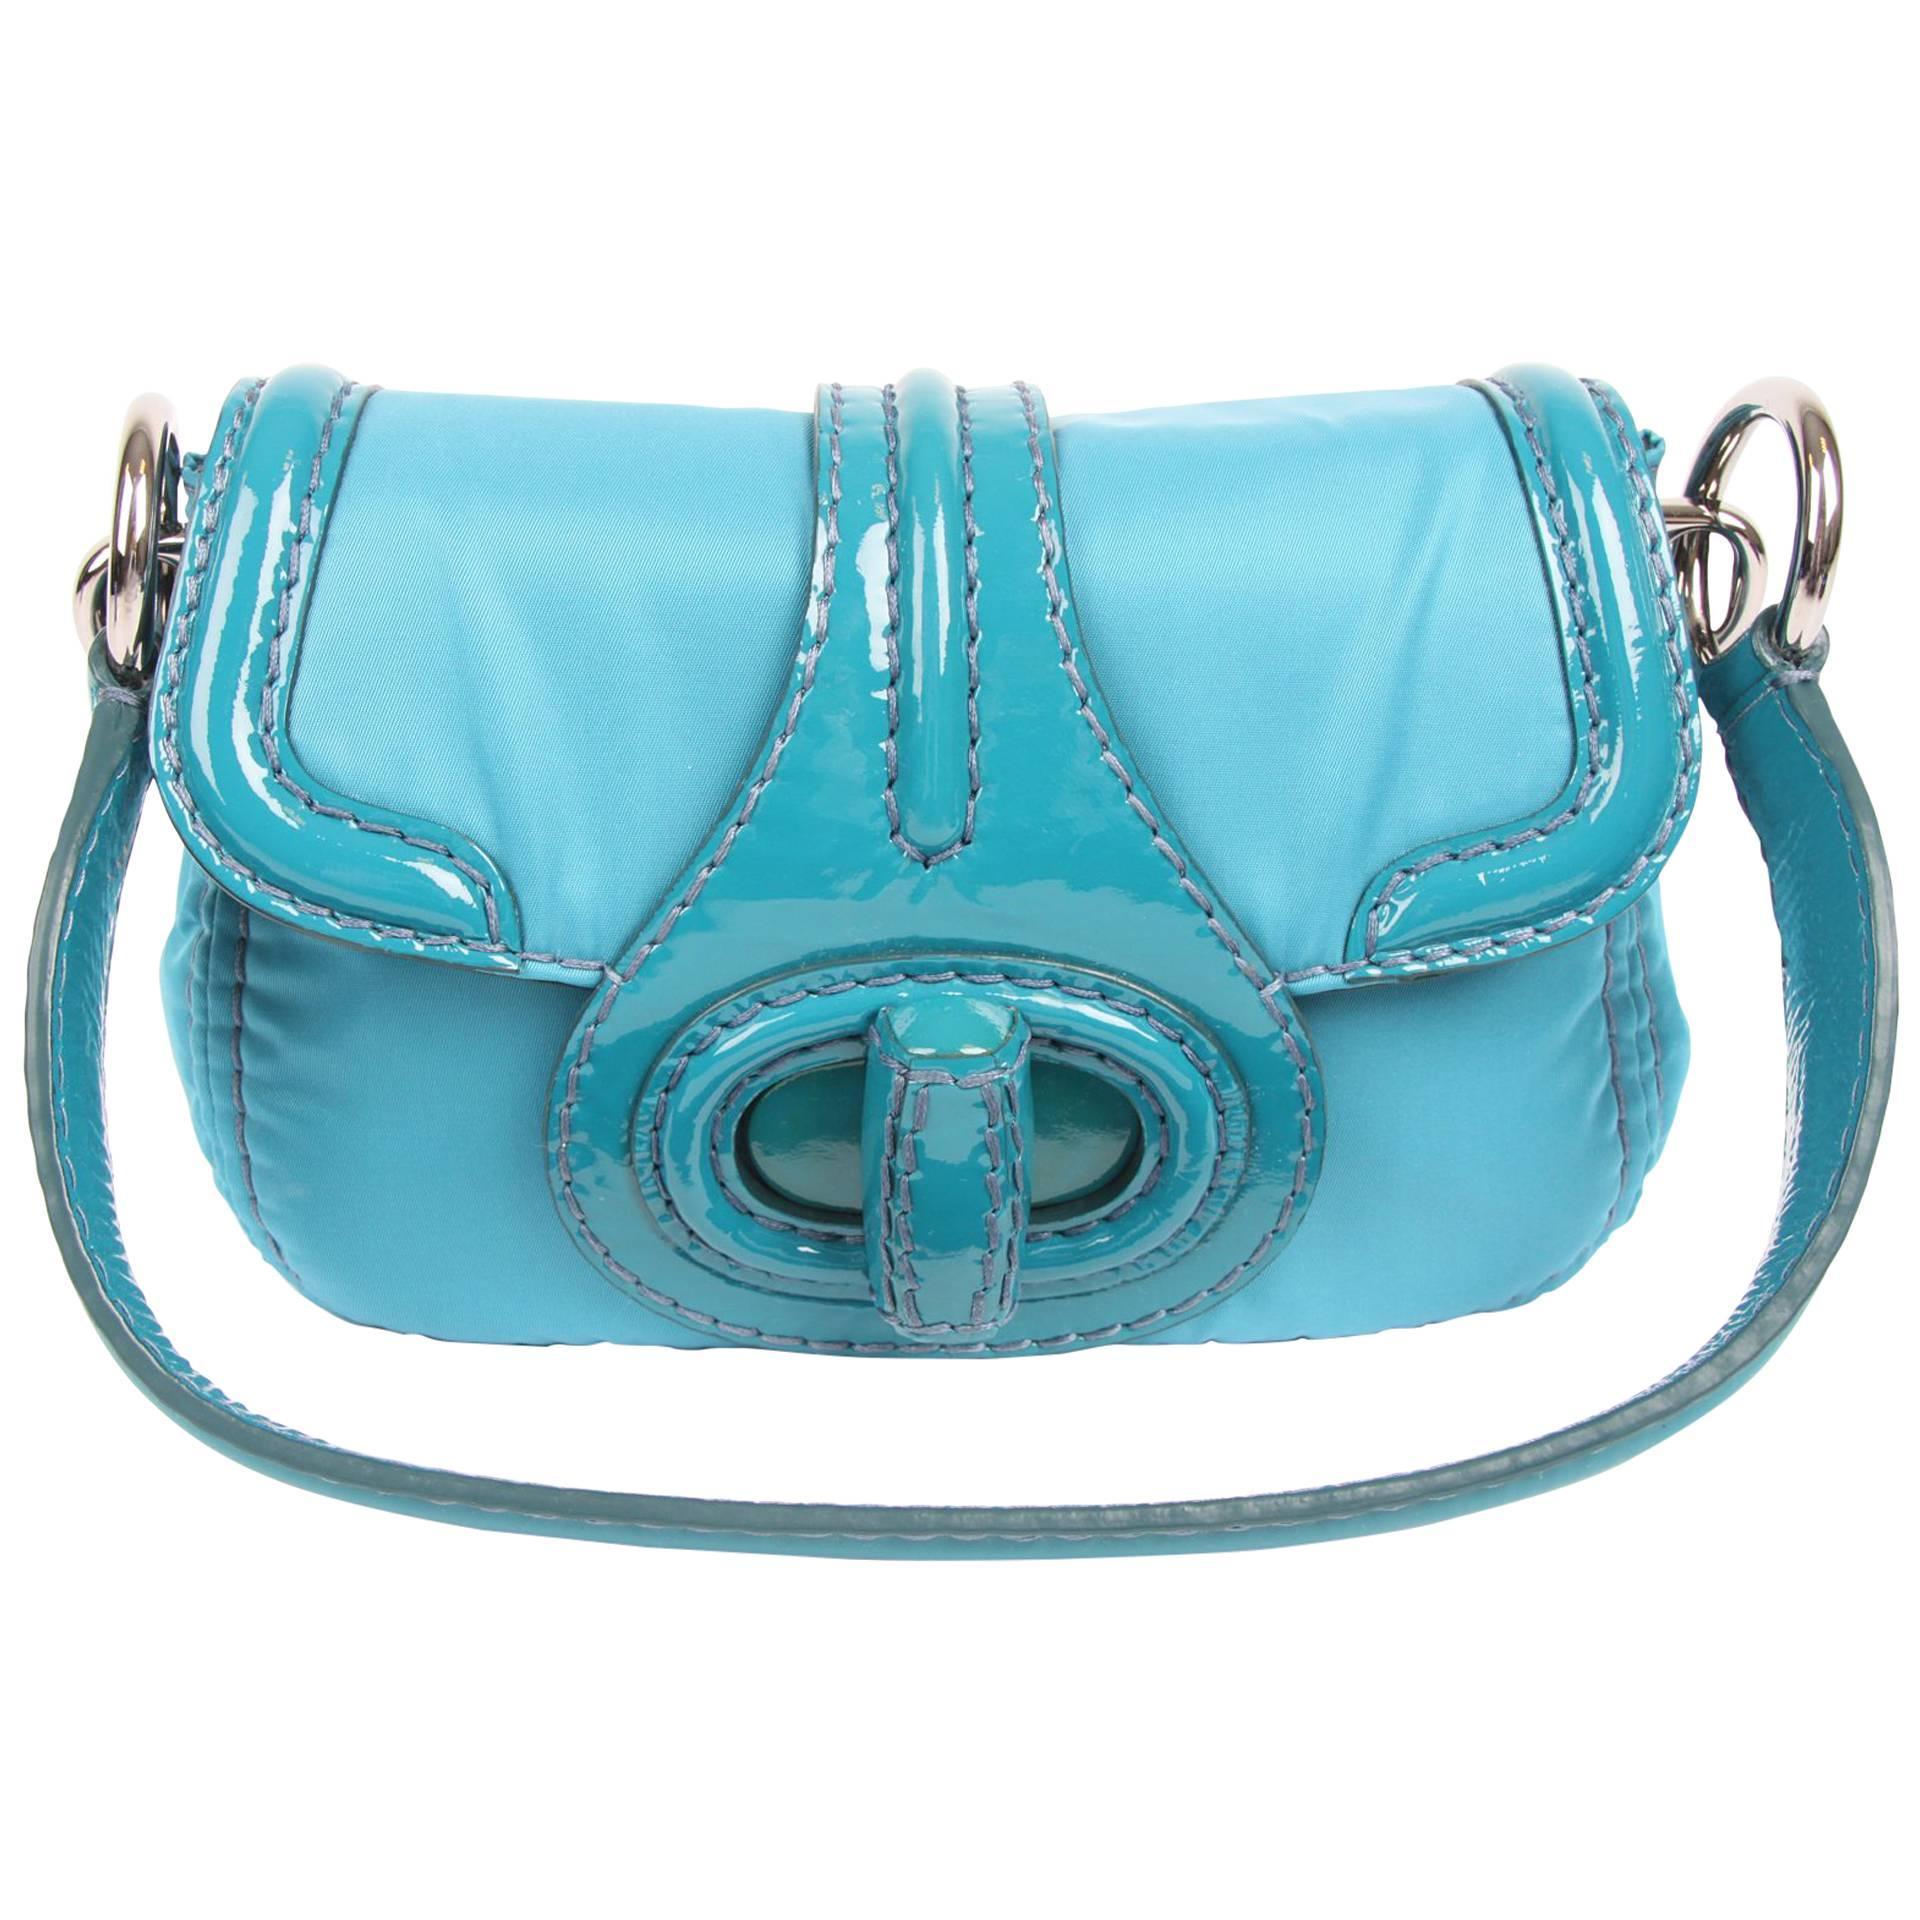 1stdibs Escada Pearl Lime Green Reptile Embossed Leather Handbag 1980s New Never Used Yq548QxJ3T